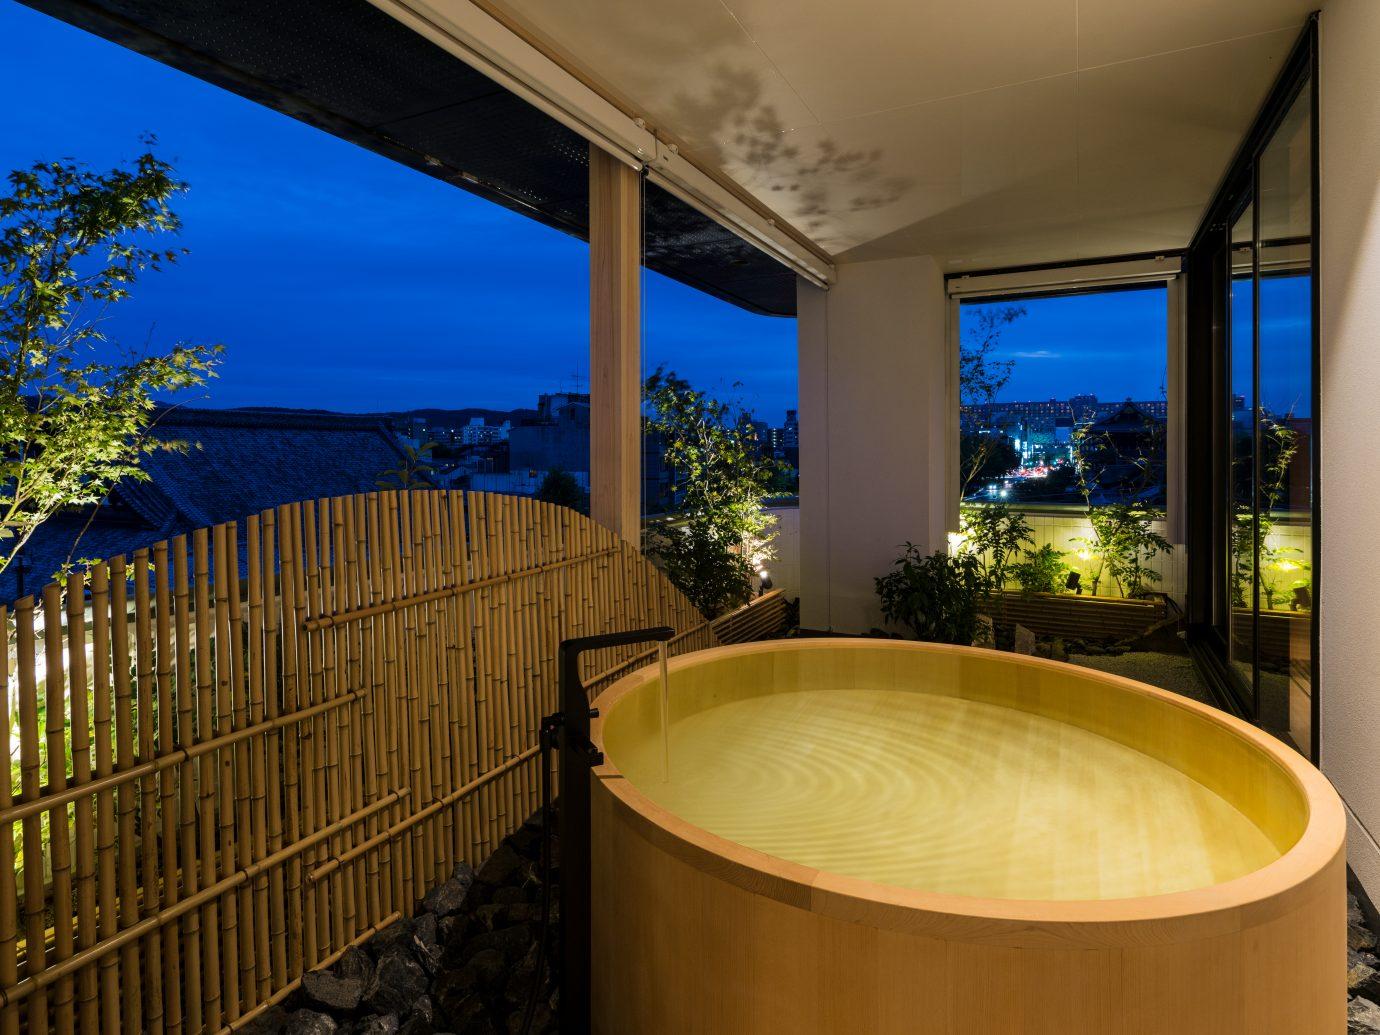 outdoor large wooden circle bathtub at night